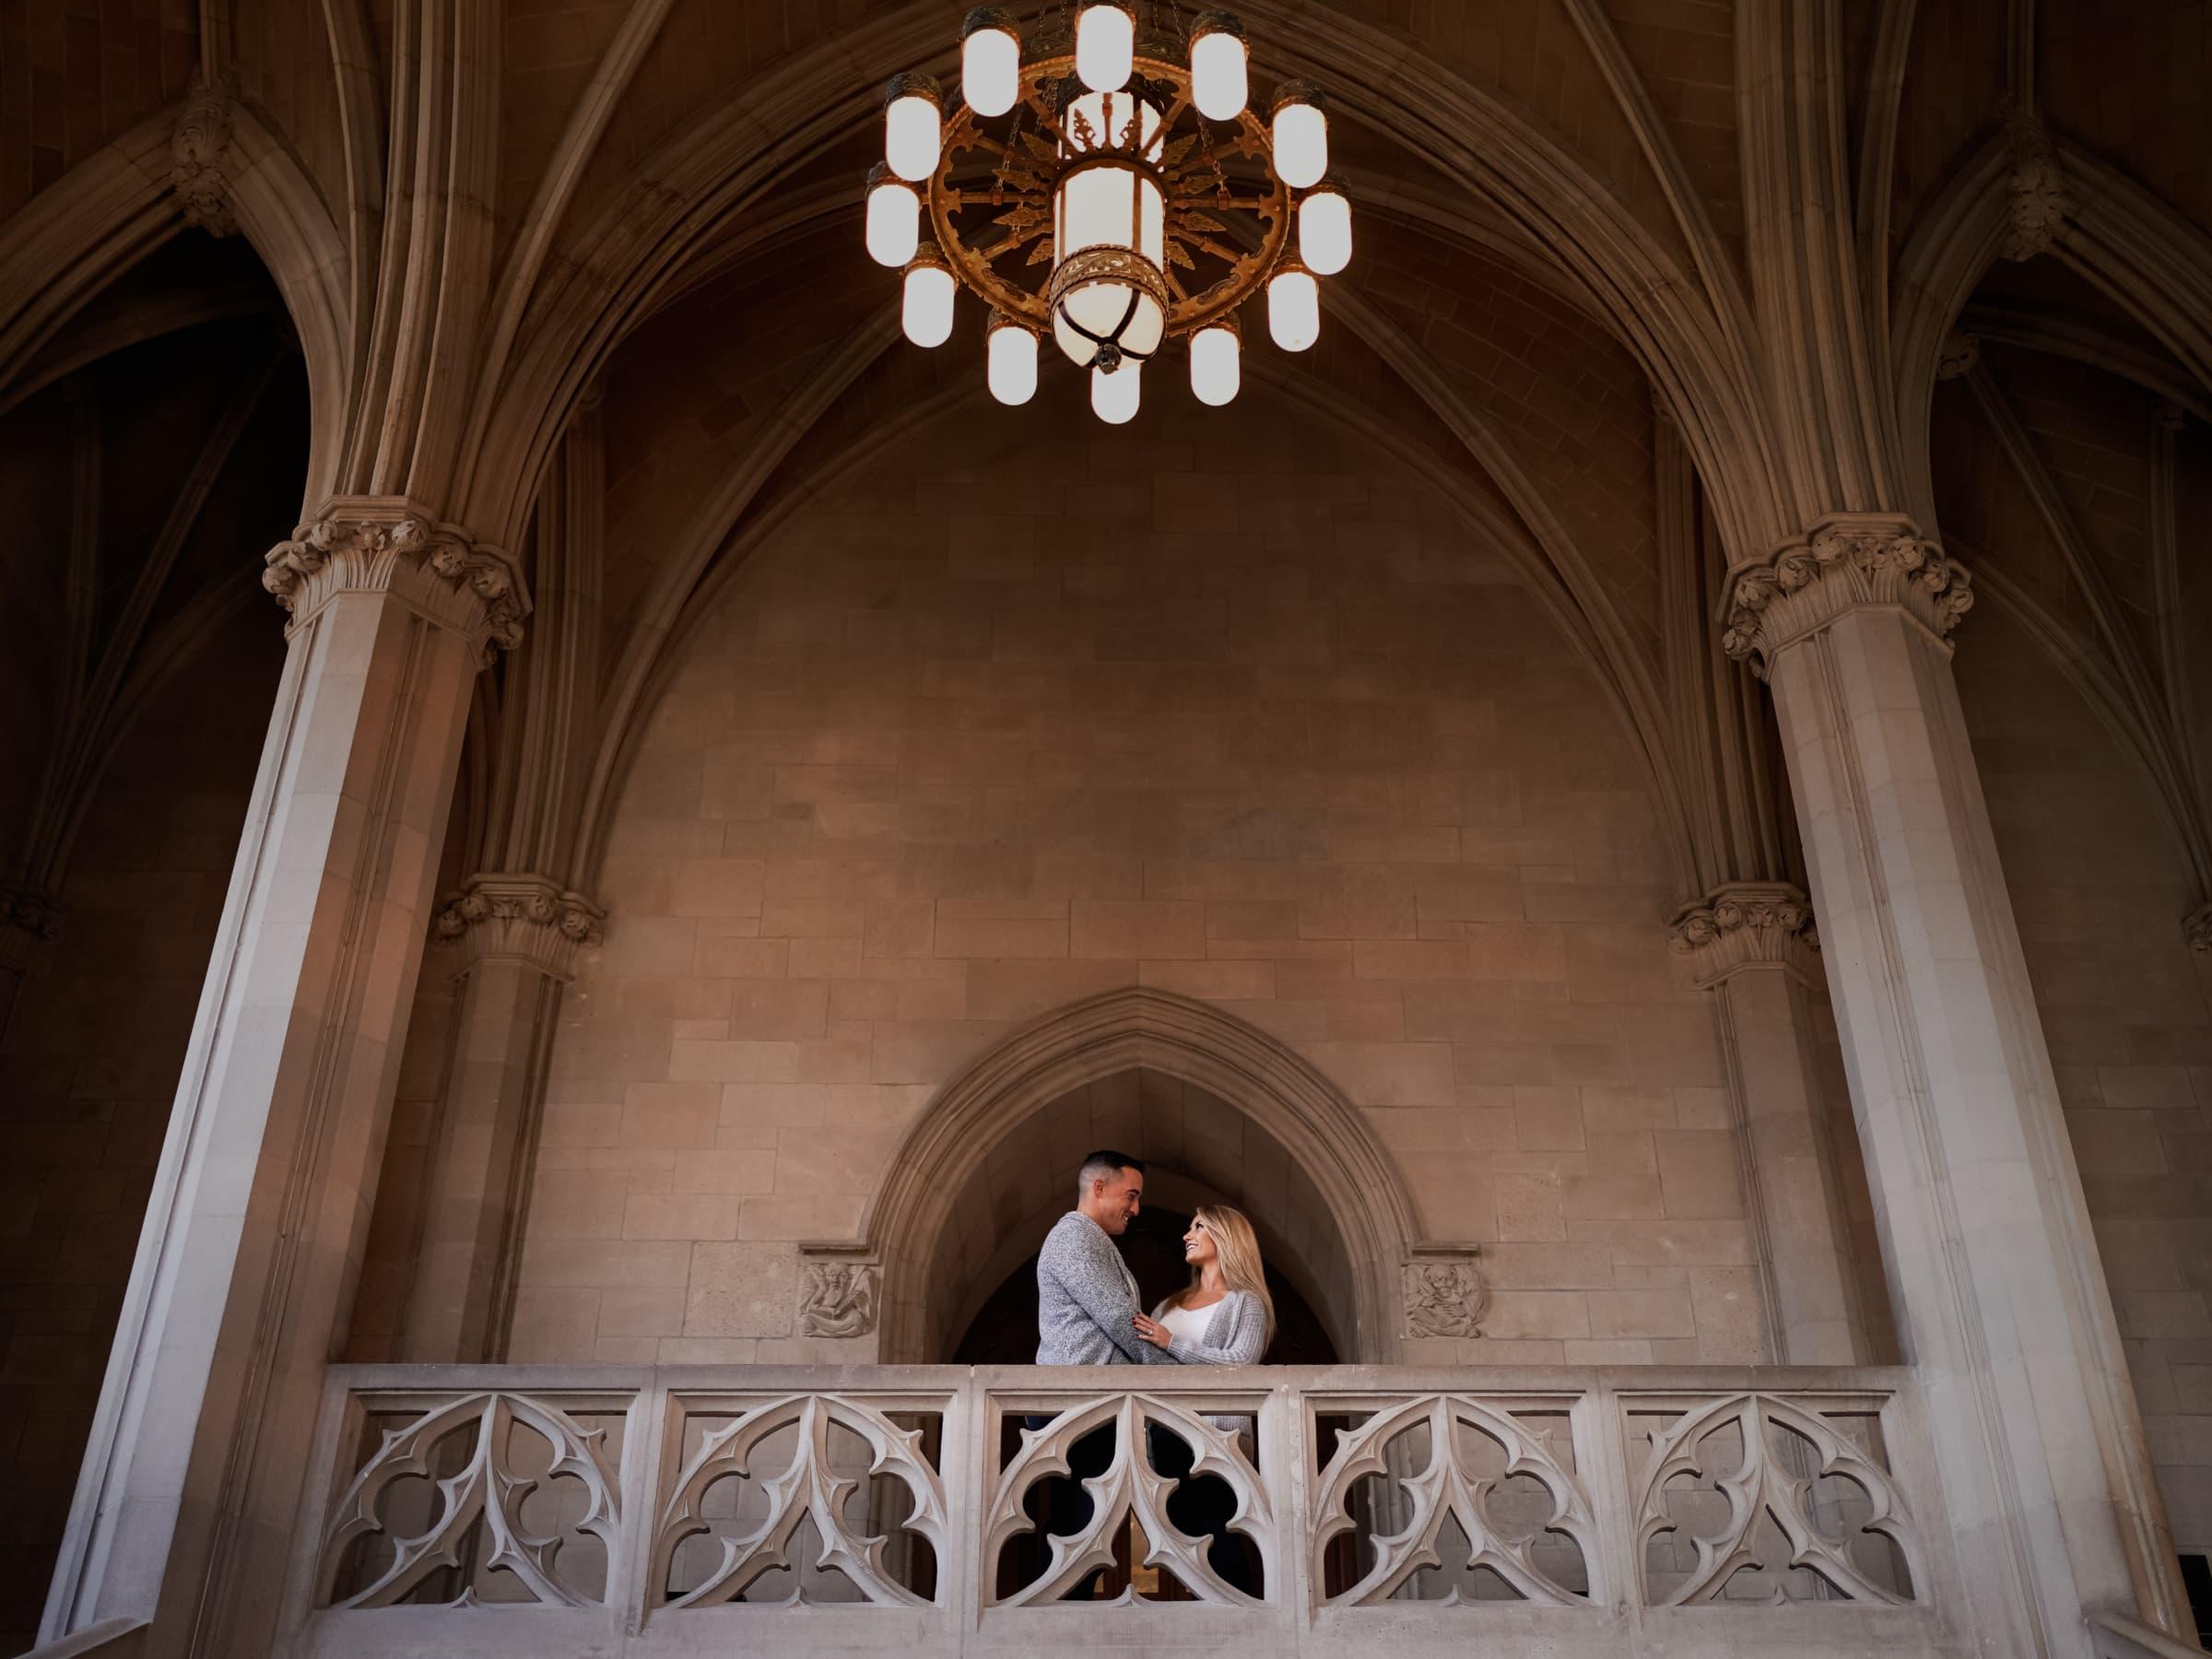 Raleigh, Durham & Chapel Hill NC Wedding & Portrait Photographer | Joe Payne Photography